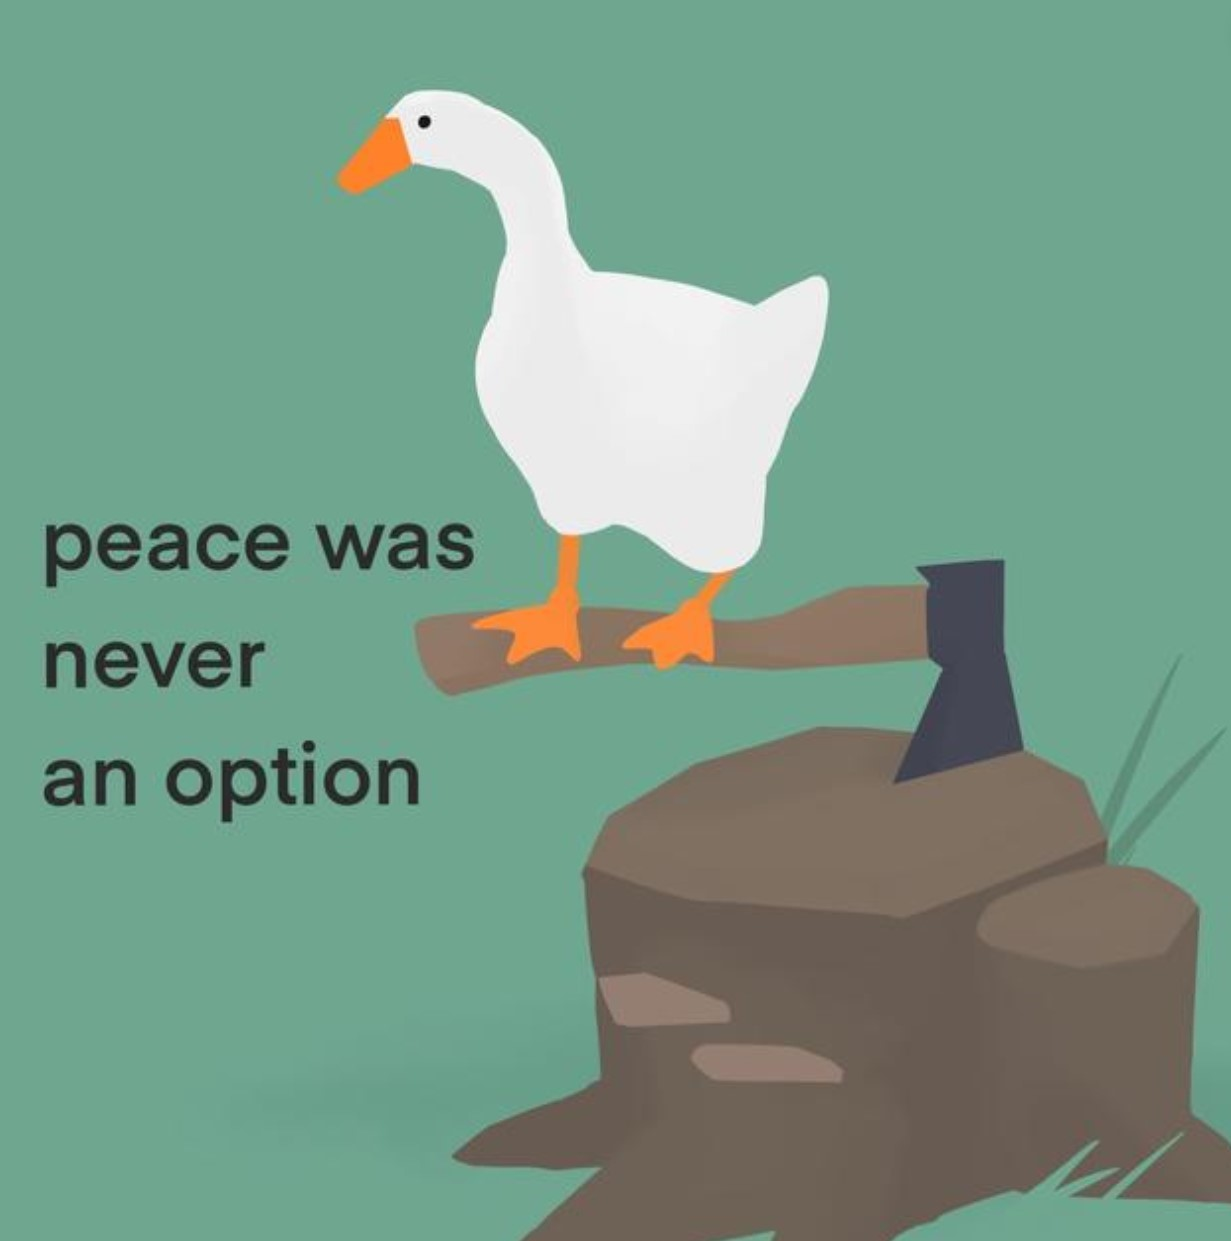 《Untitled Goose Game》超夯白目「鹅」整人游戏!结果现实中真有大鹅破窗遭到逮捕 - 宅男圈